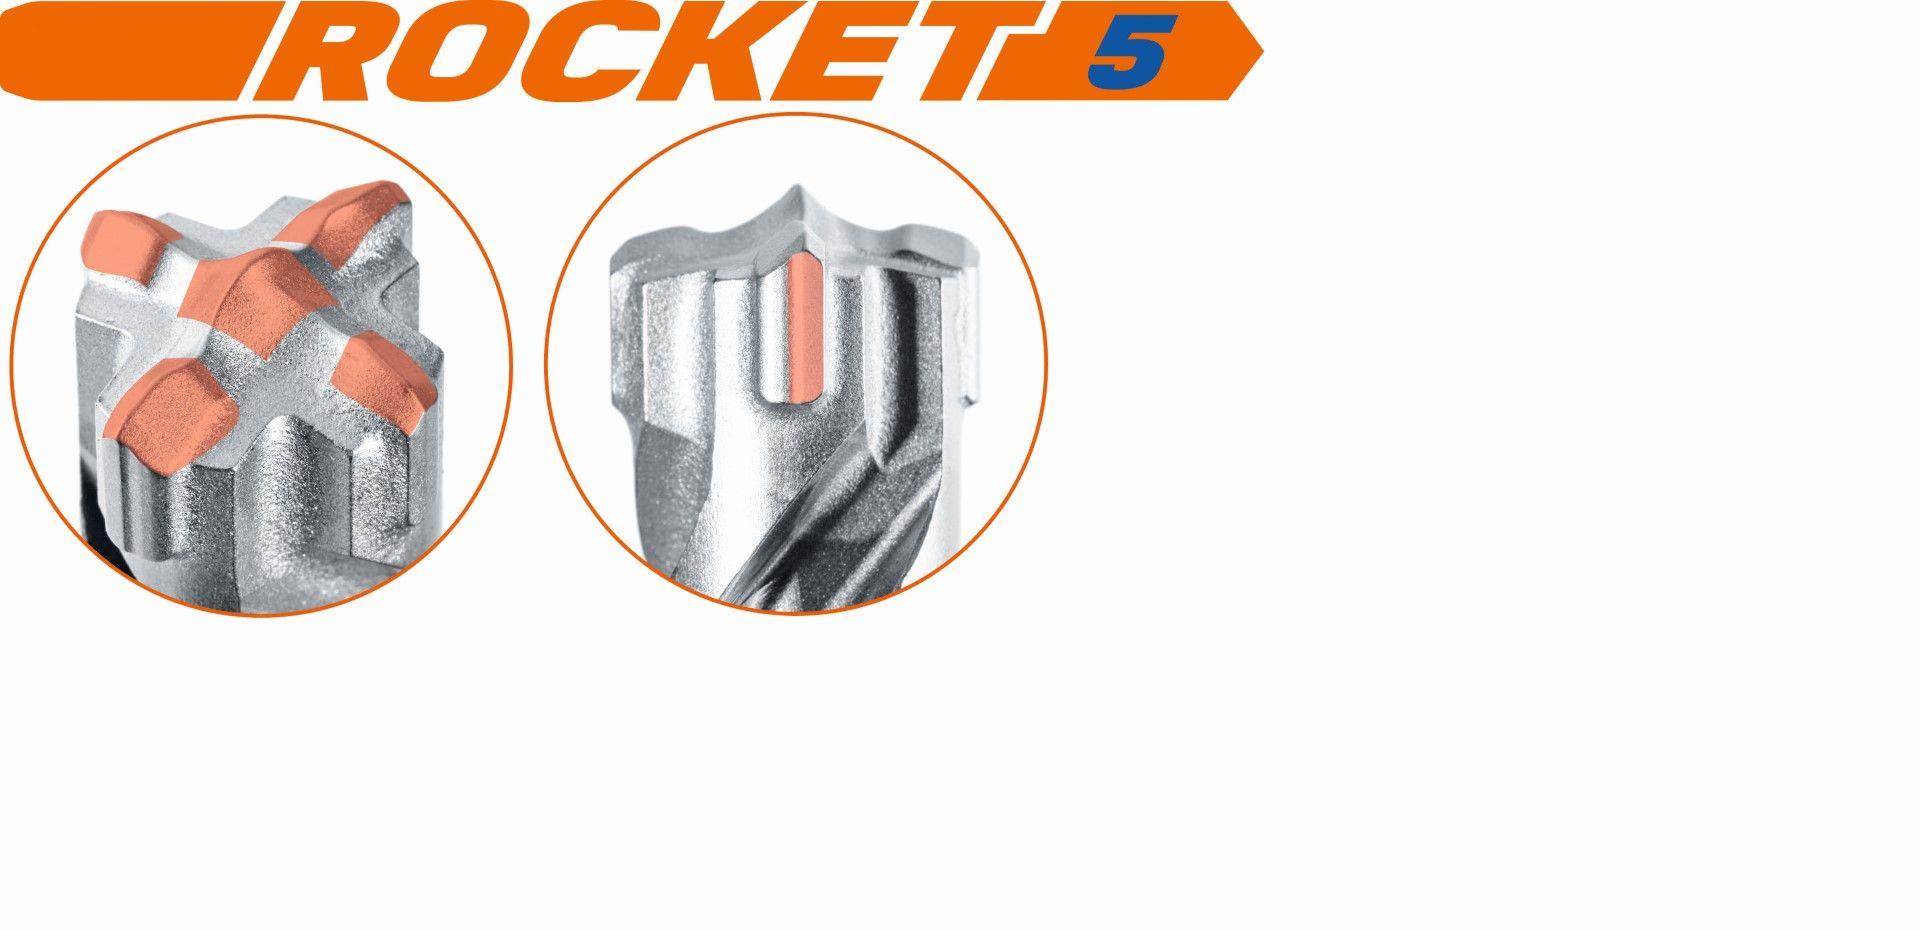 Slika BORER Rocket 5 SDS-plus 16x260mm 4-kraka